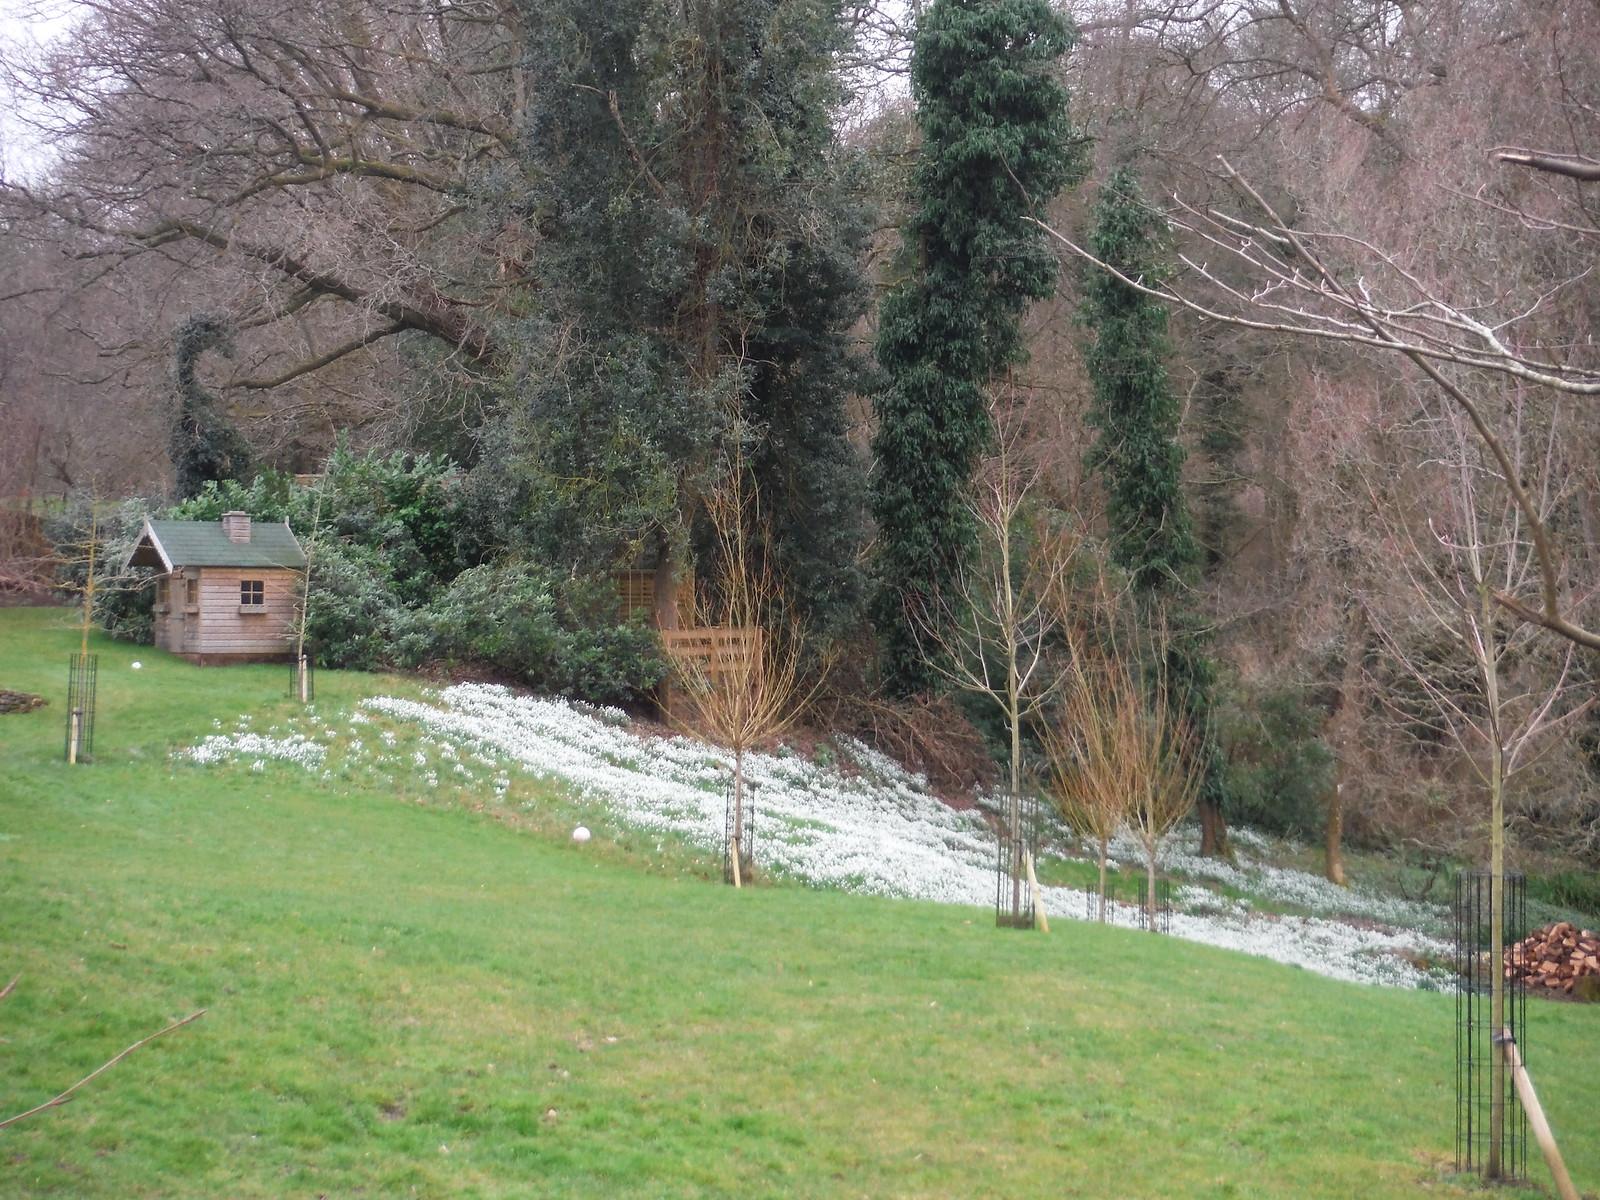 Smallbrook Barn (Snowdrops in Garden) SWC Walk 144 Haslemere to Farnham